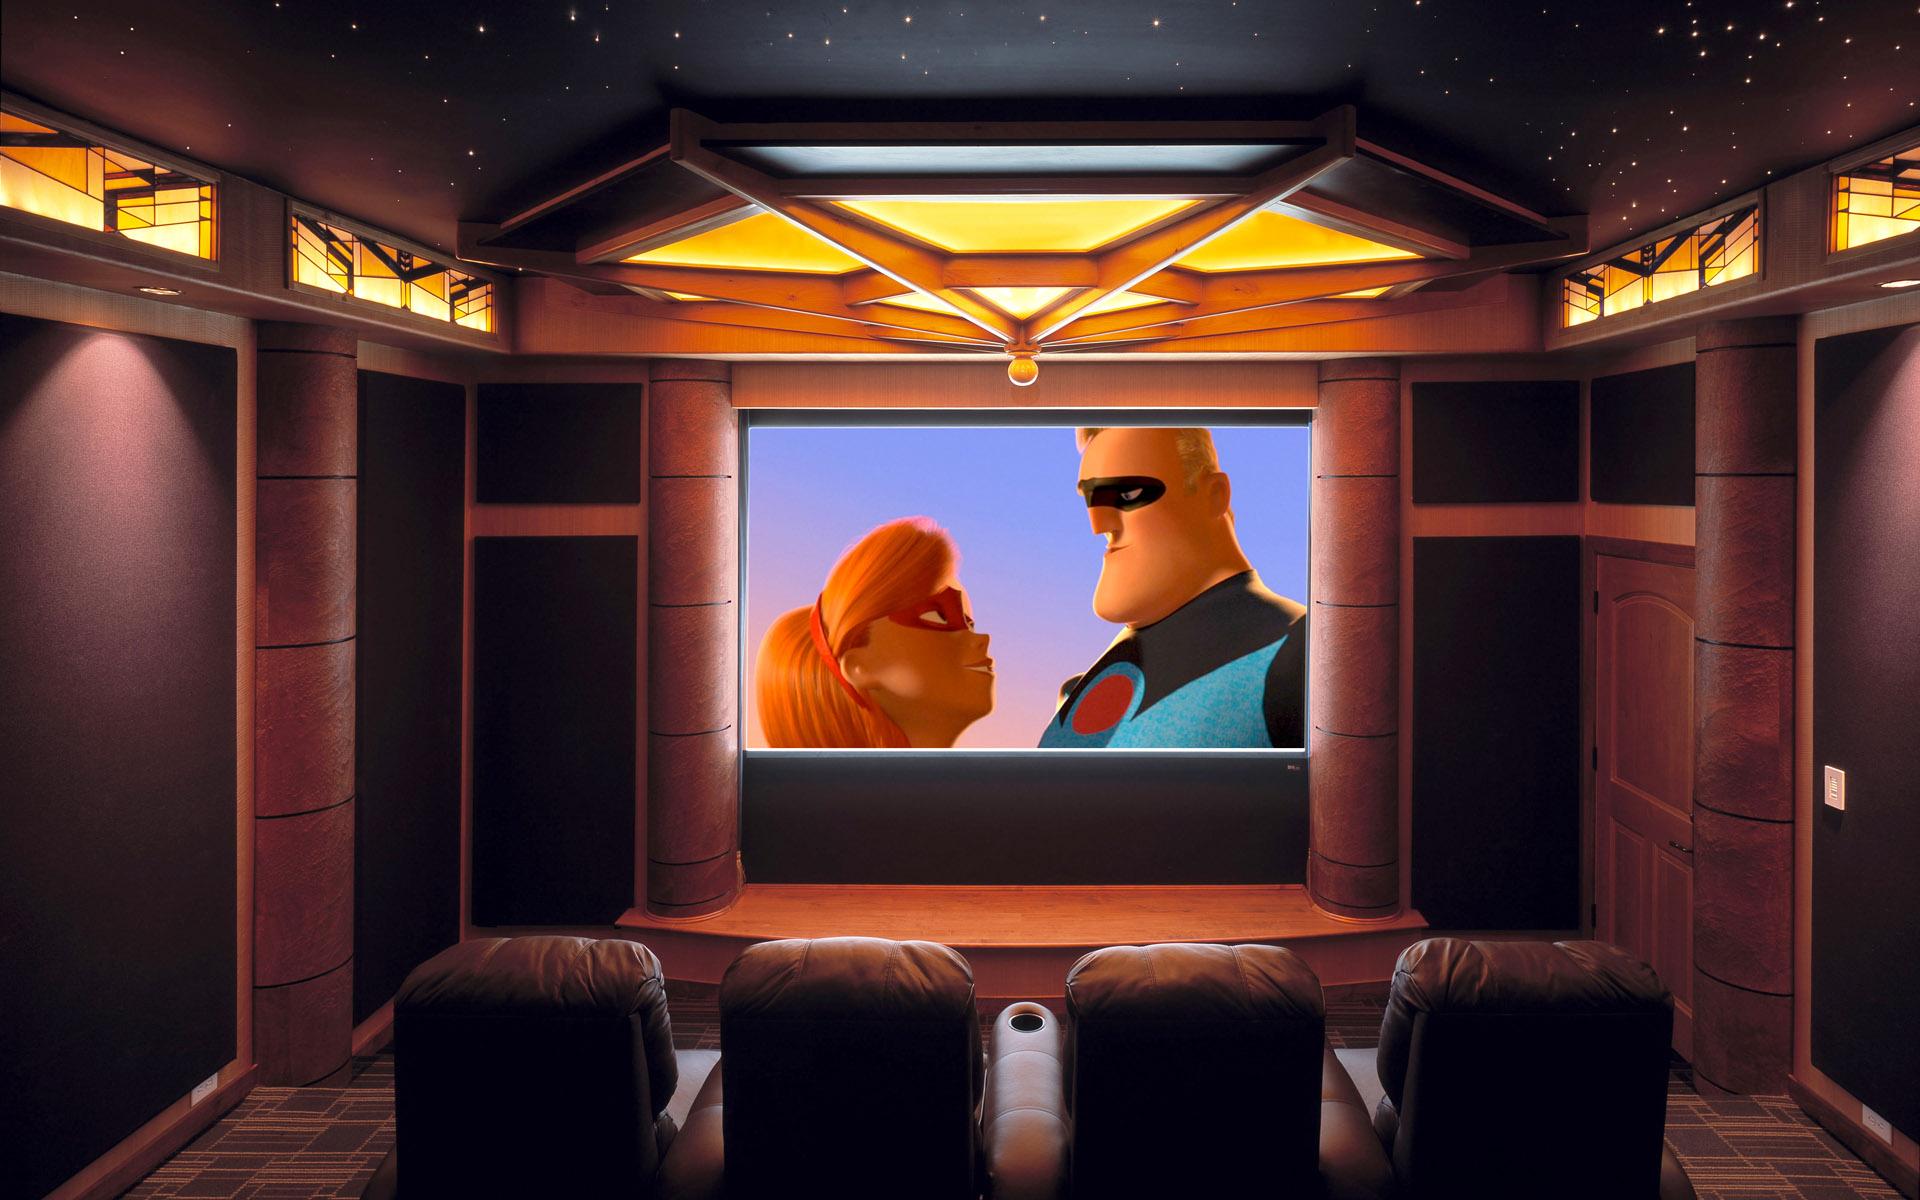 Entertainment For Home Theater 399488 Wallpaper Wallpaper